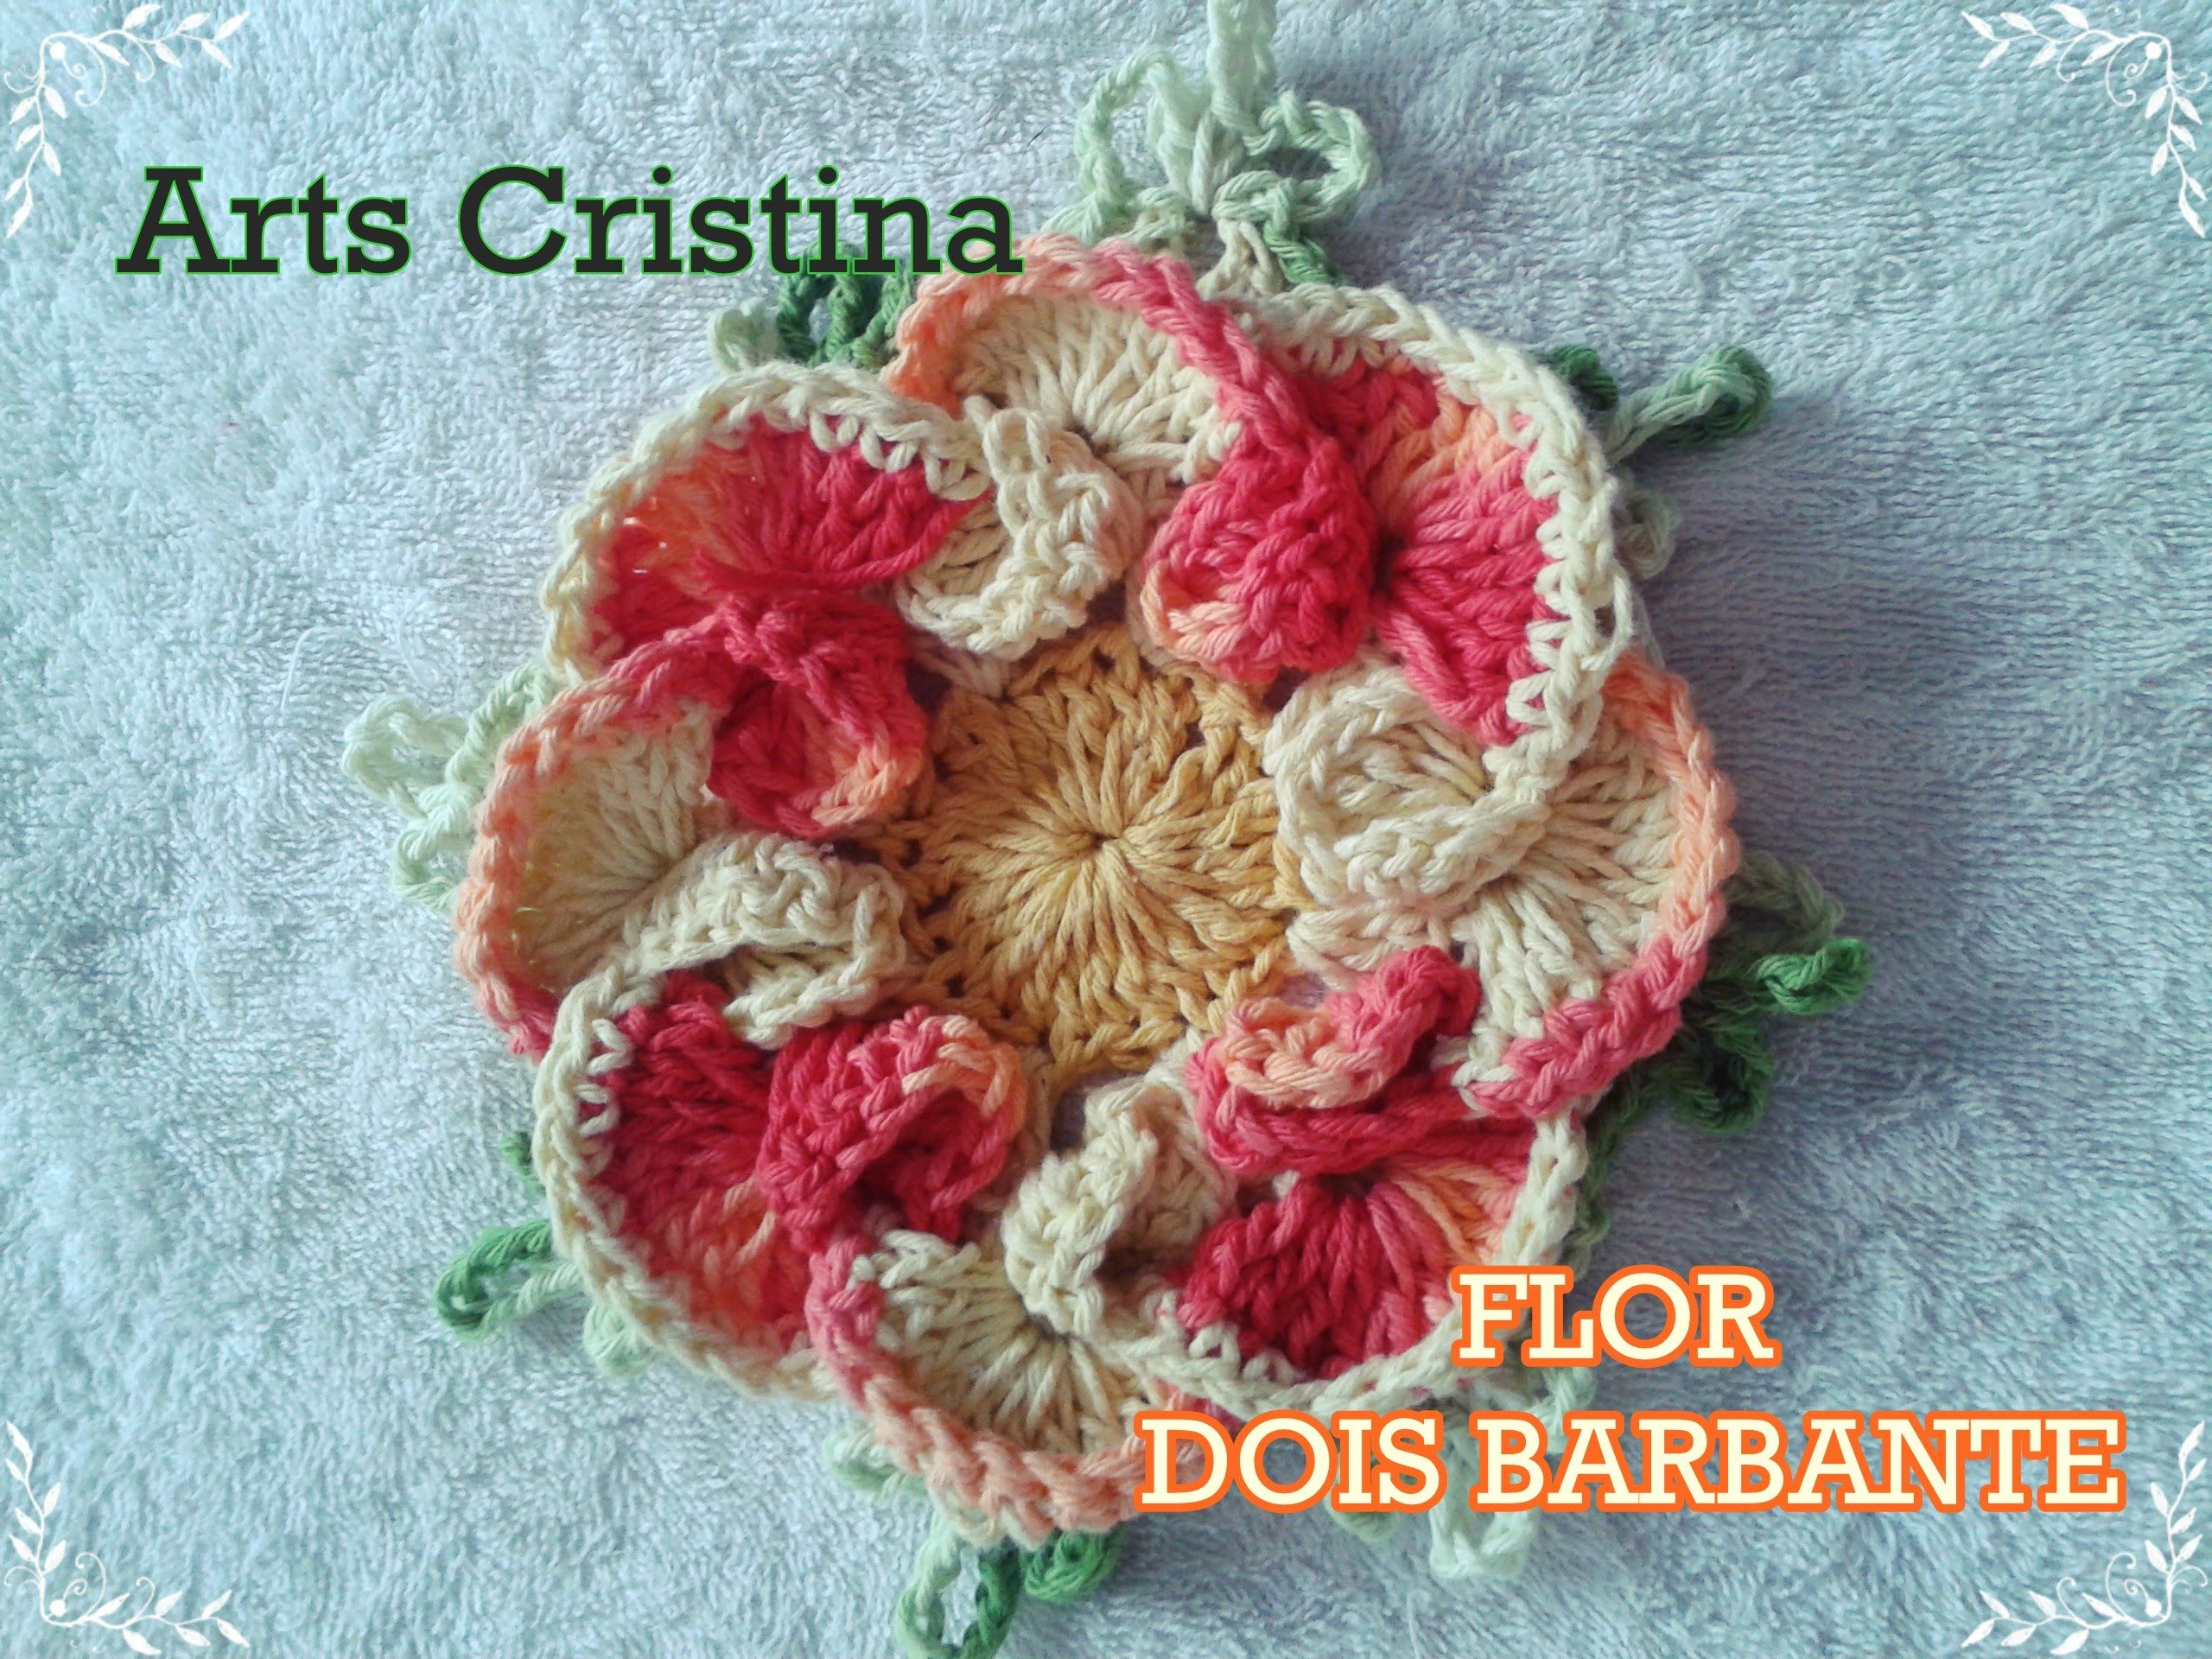 FLOR DE CROCHE DOIS BARBANTES | ARTS CRISTINA